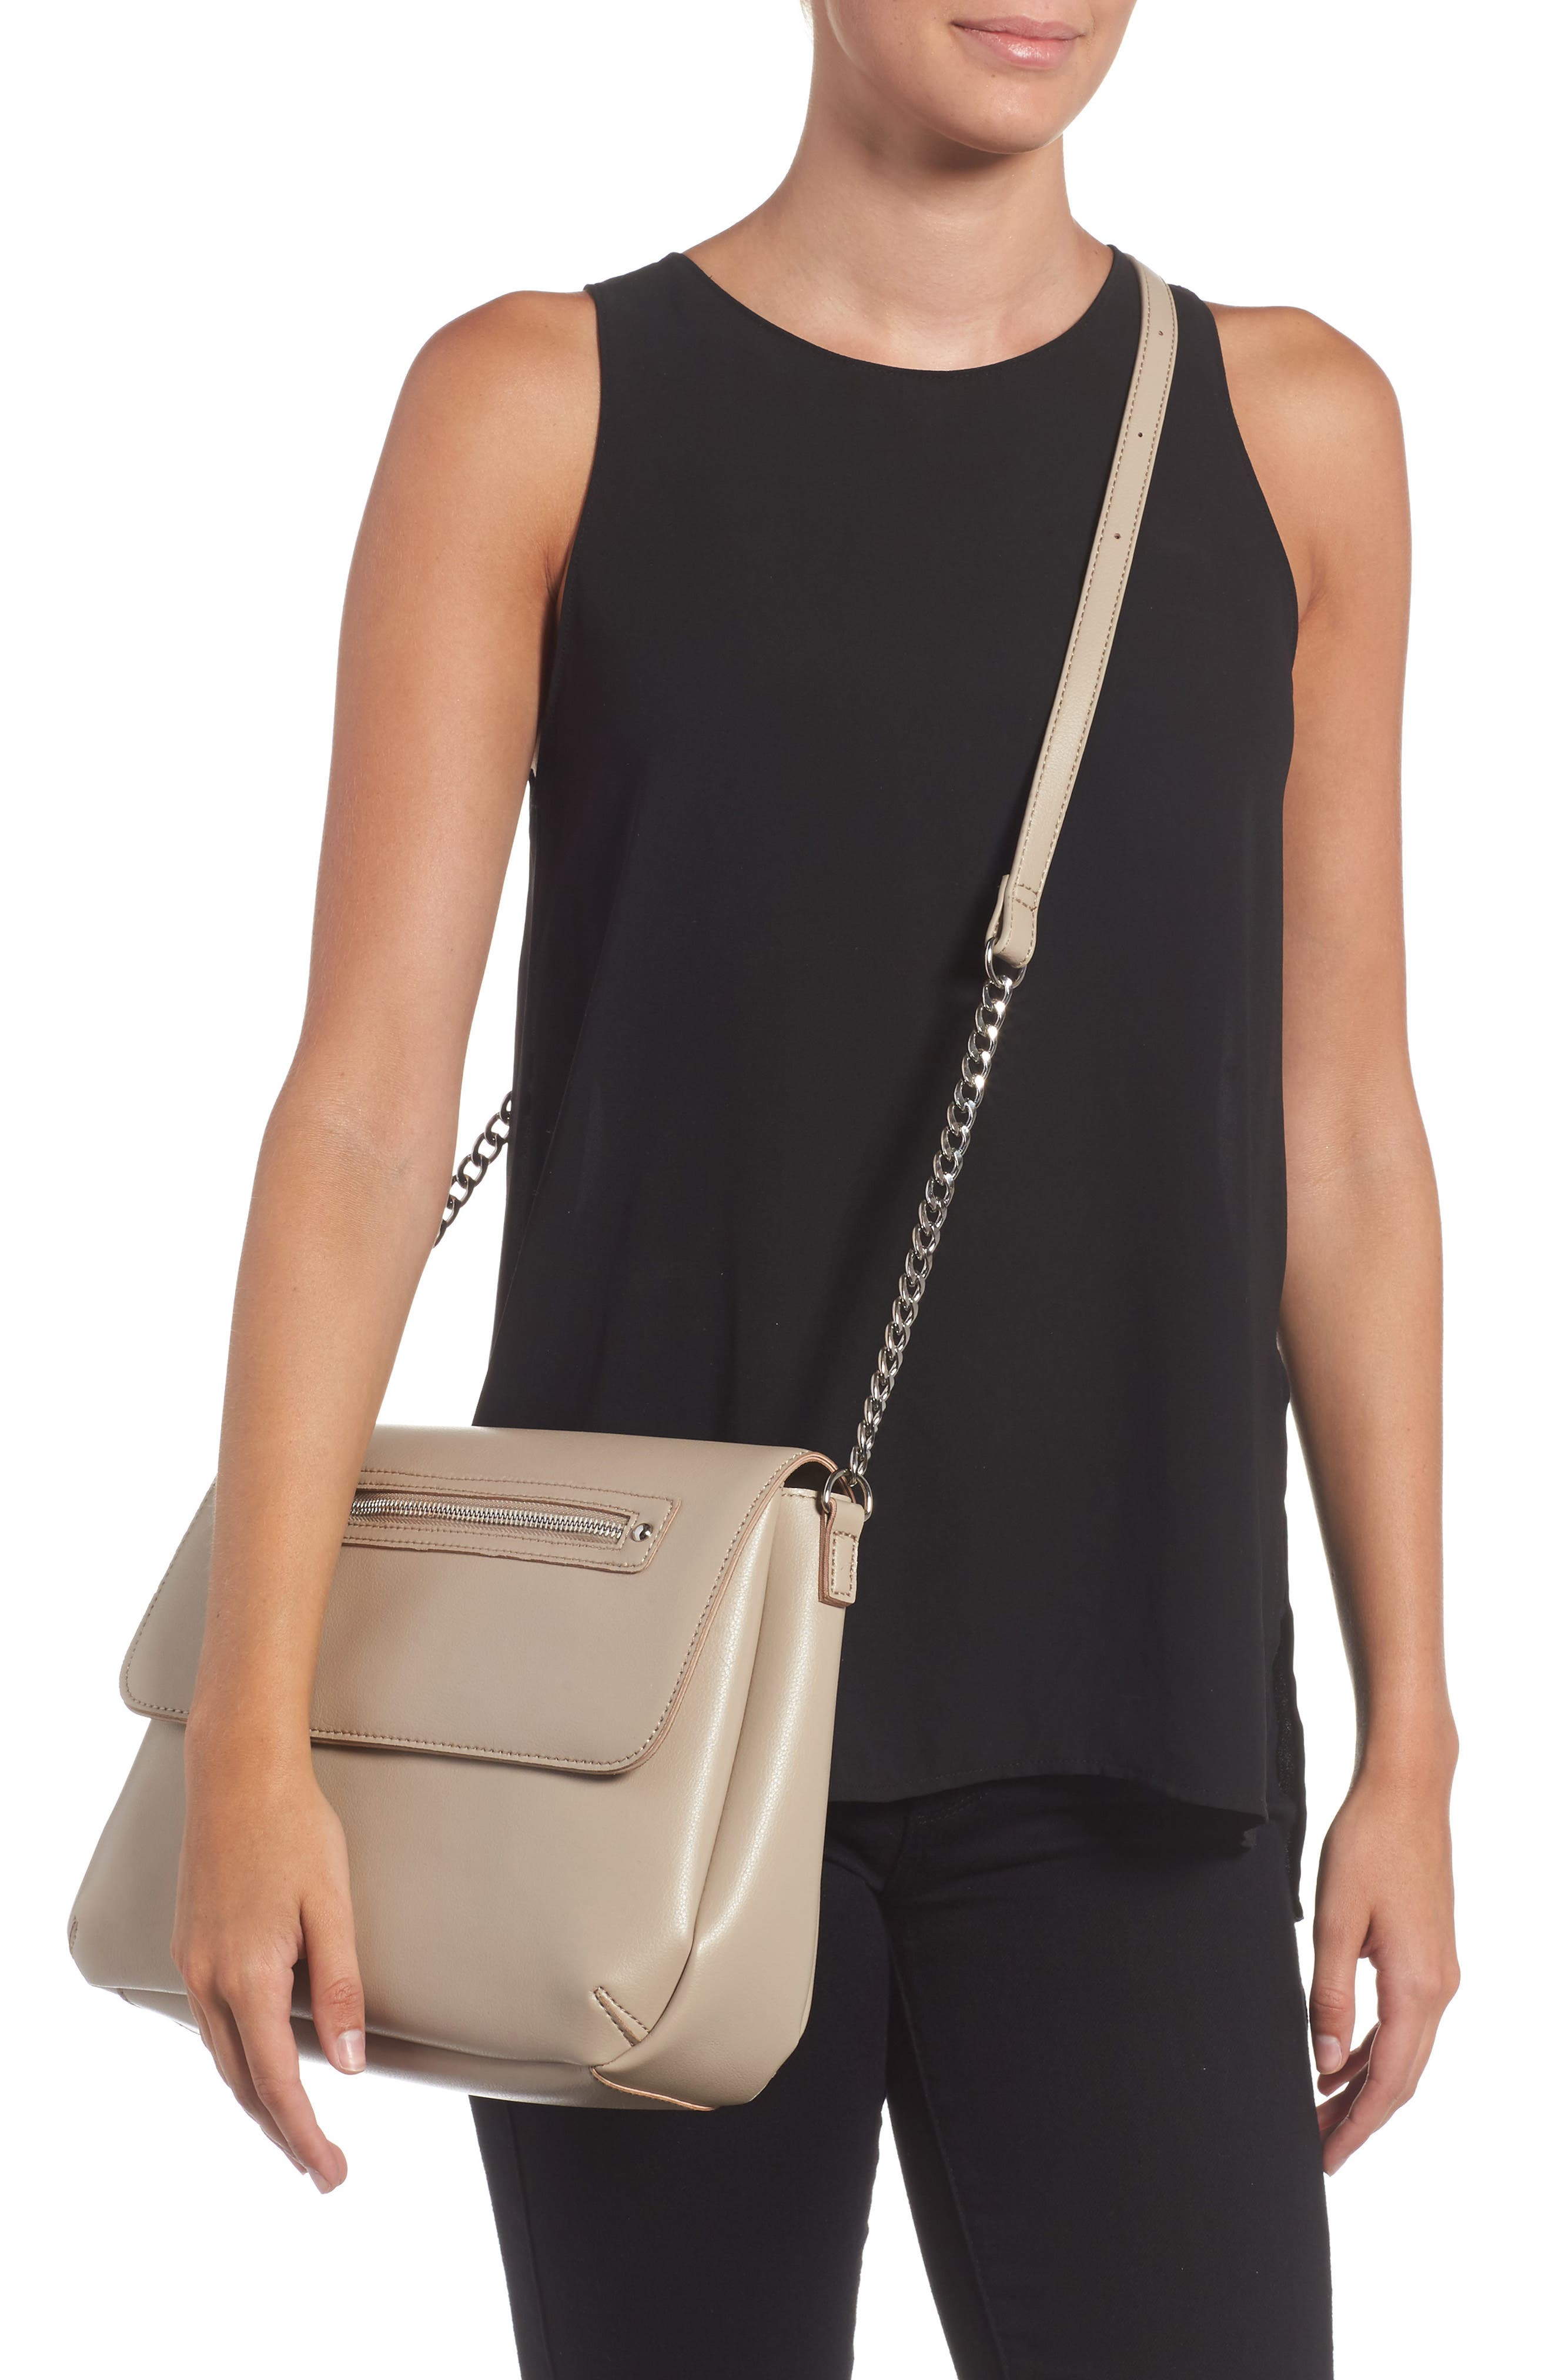 BP., Faux Leather Flap Crossbody Bag, Alternate thumbnail 2, color, 020